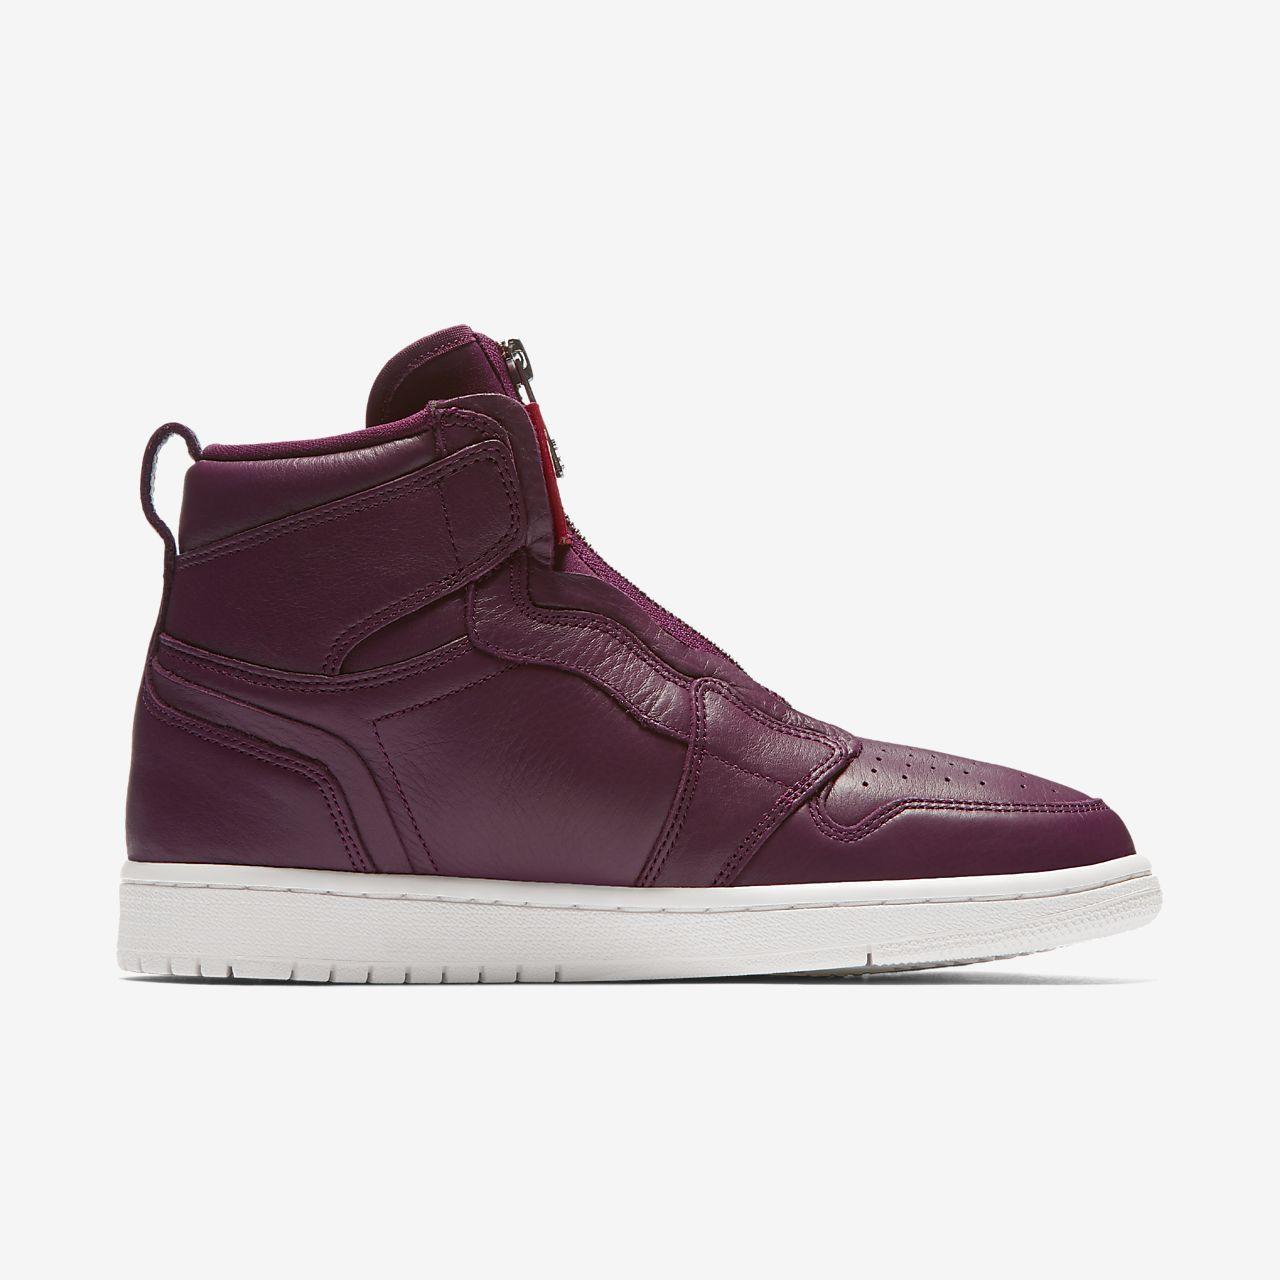 promo code d56f1 59e88 ... Air Jordan 1 High Zip Premium Women s Shoe